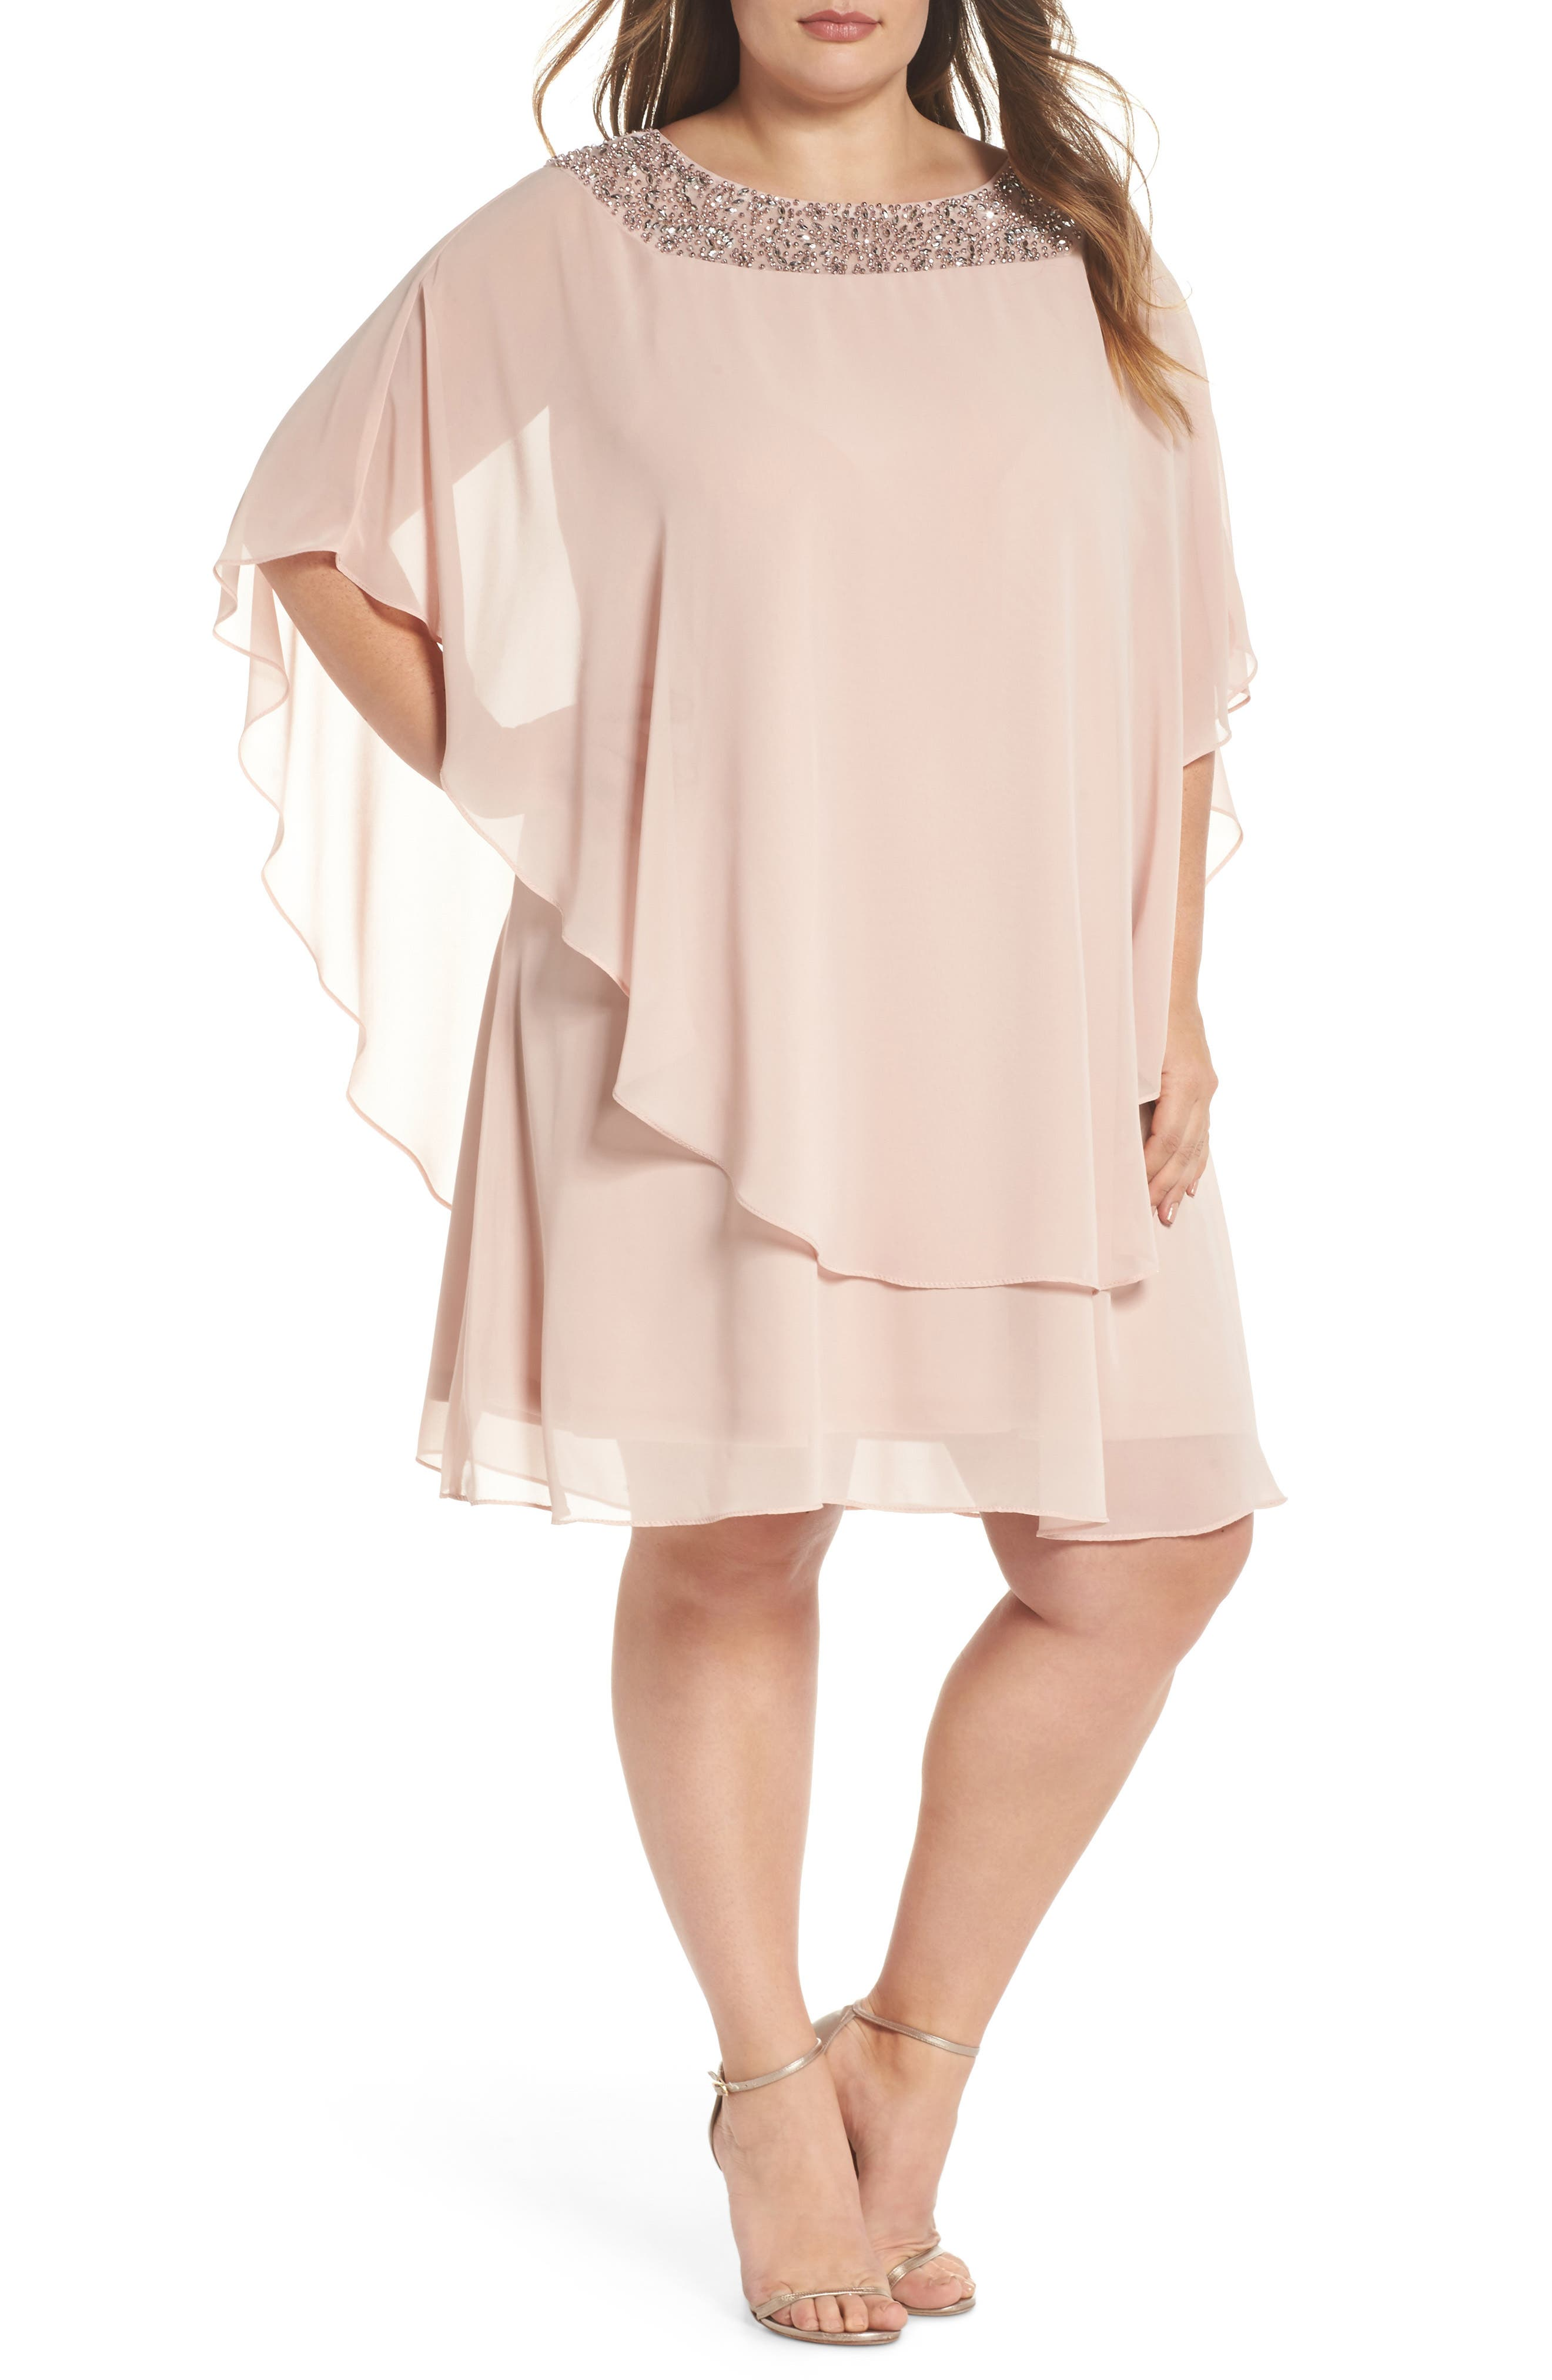 XSCAPE Beaded Neck Chiffon Overlay Dress, Main, color, BLUSH/ SILVER